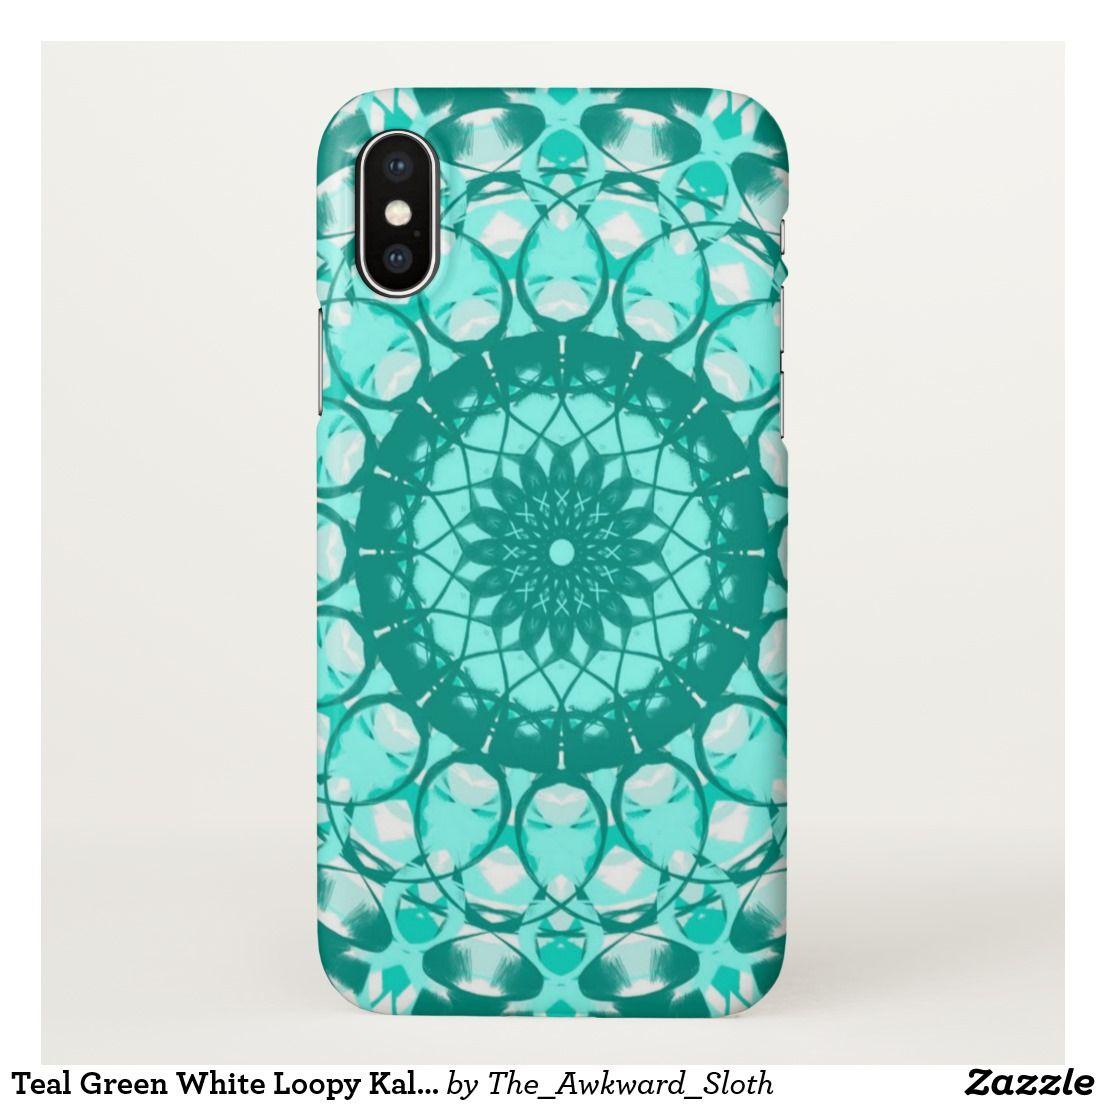 Teal Green White Loopy Kaleidoscope Iphone Case Zazzle